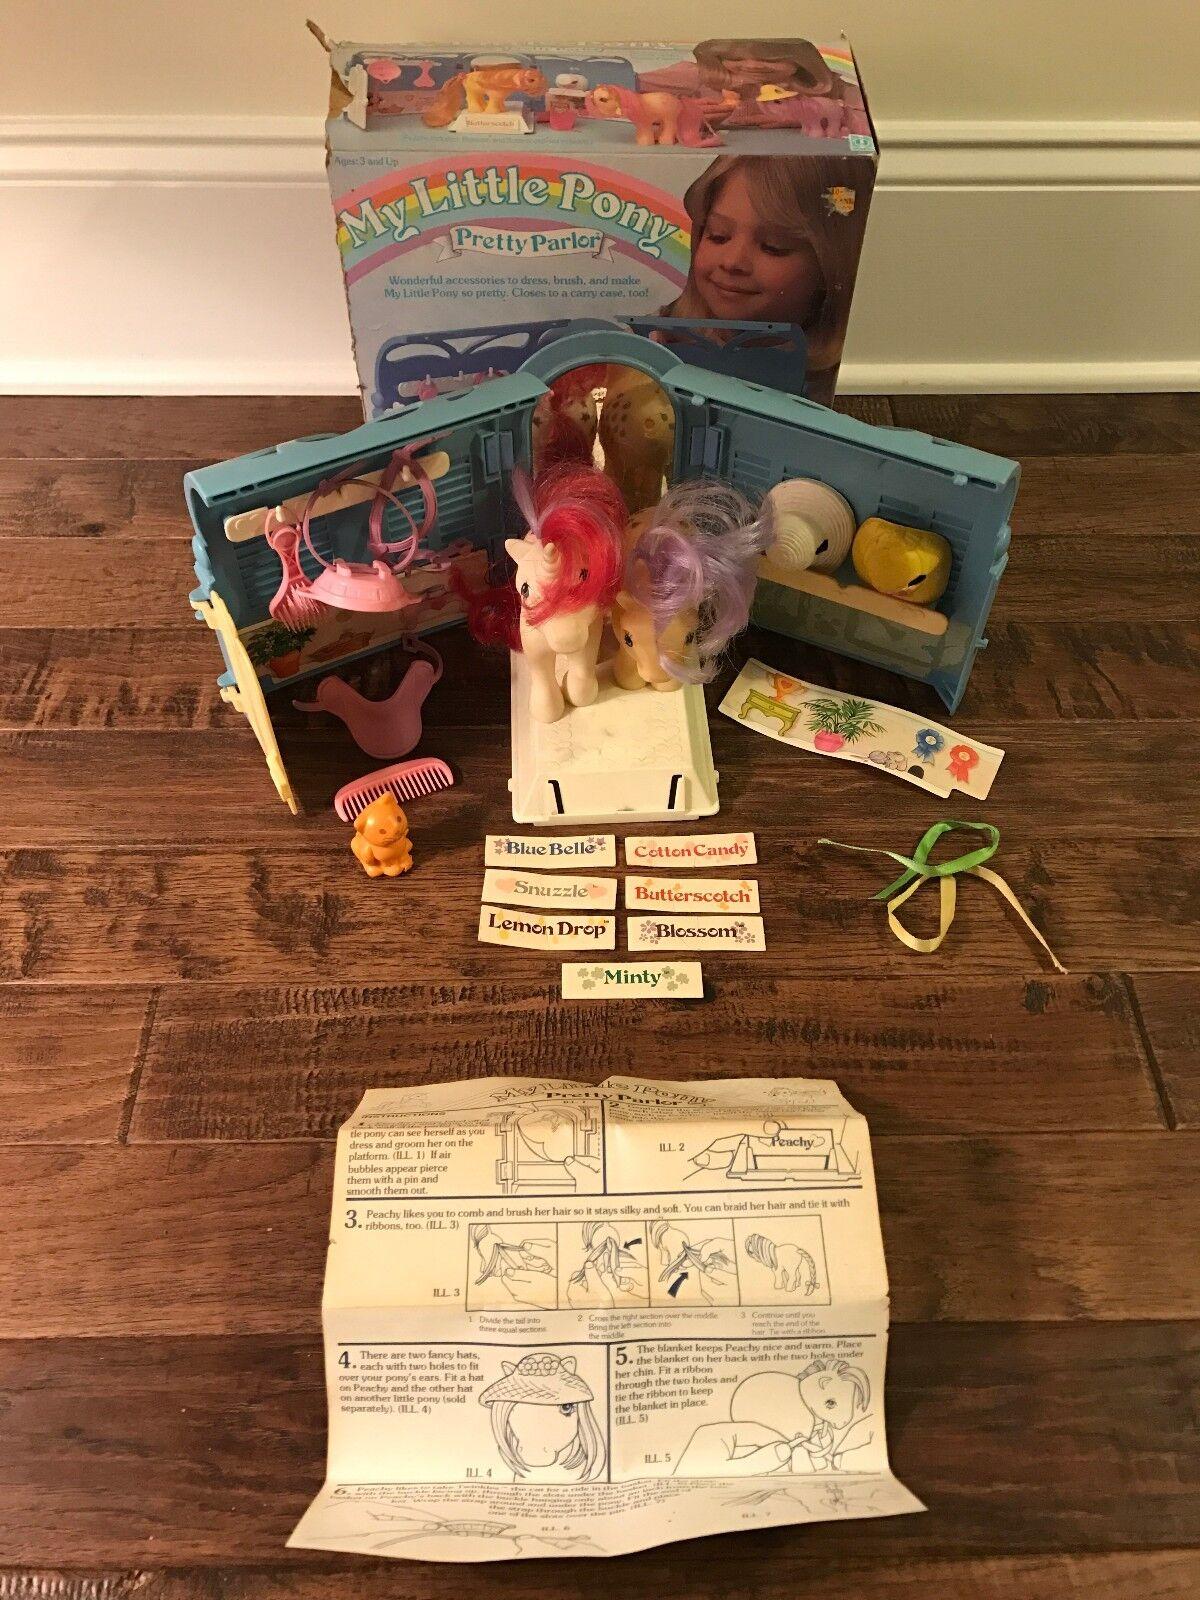 1983 Vintage Hasbro  MY LITTLE PONY    (PRETTY PARLOR) Playset, With Ponies, RARE  9de300